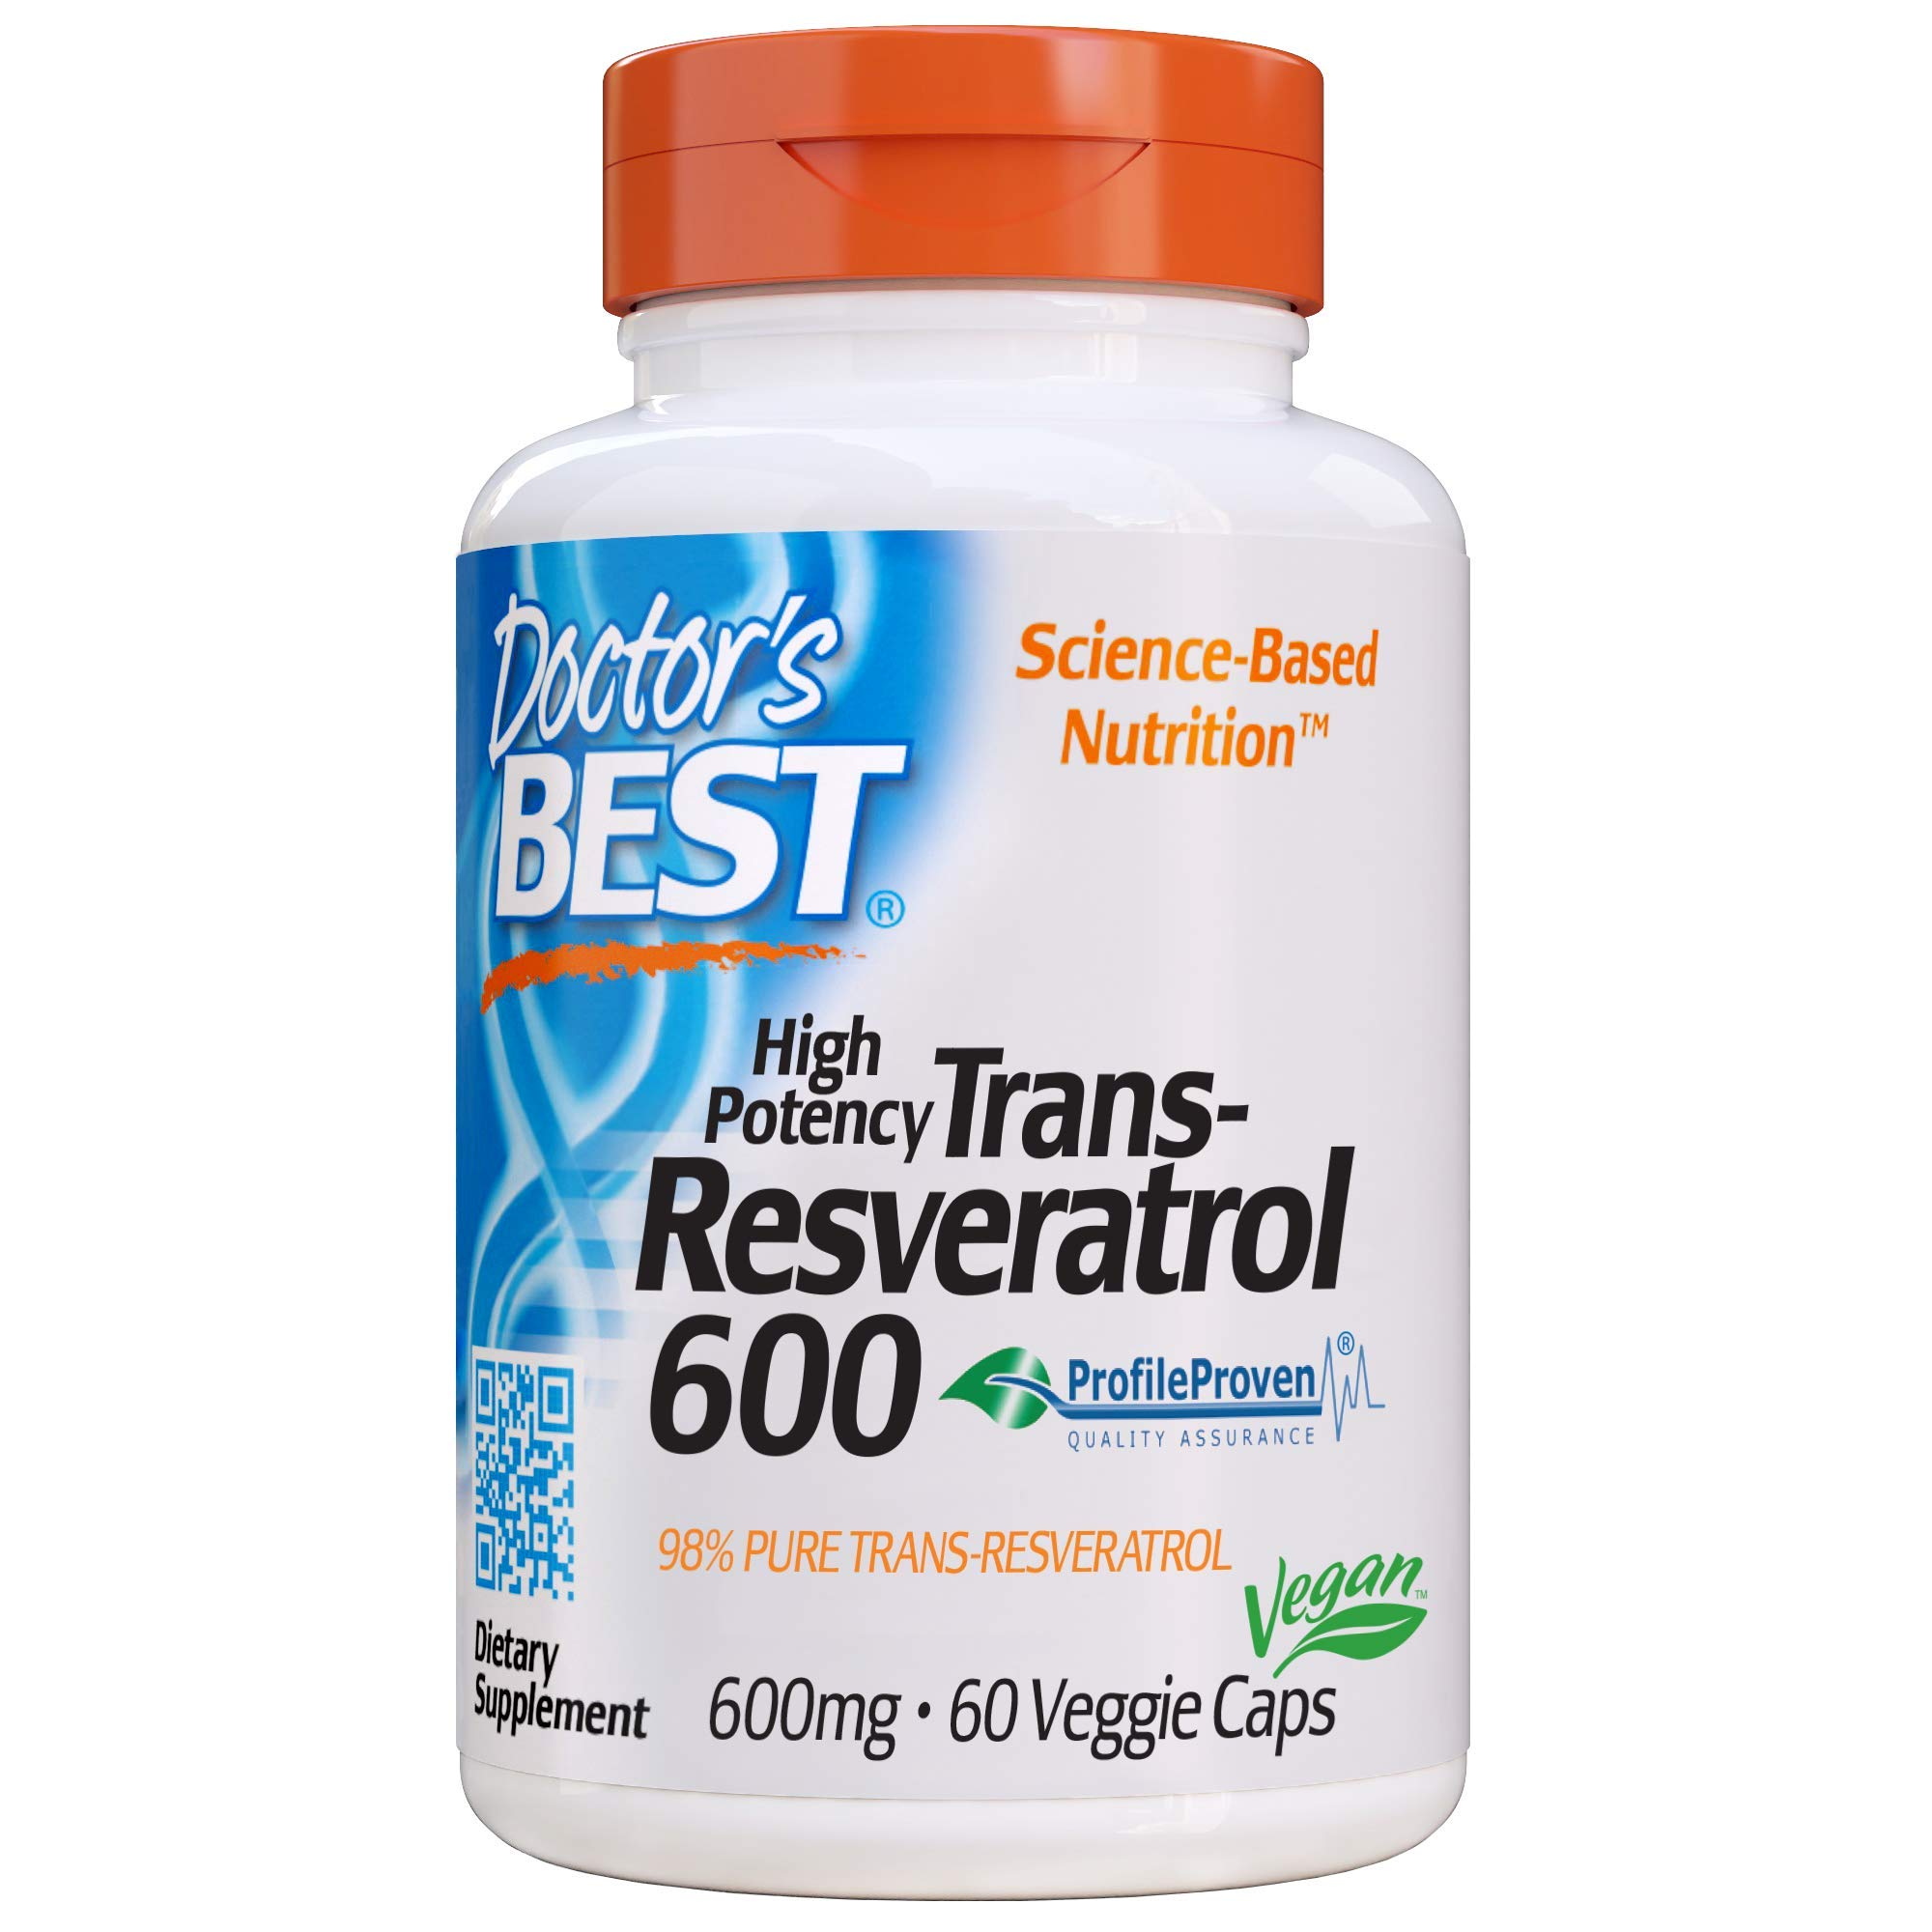 Doctor's Best Trans-Resveratrol 600, Non-GMO, Vegan, Gluten Free, Soy Free, 600 mg, 60 Veggie Caps by Doctor's Best